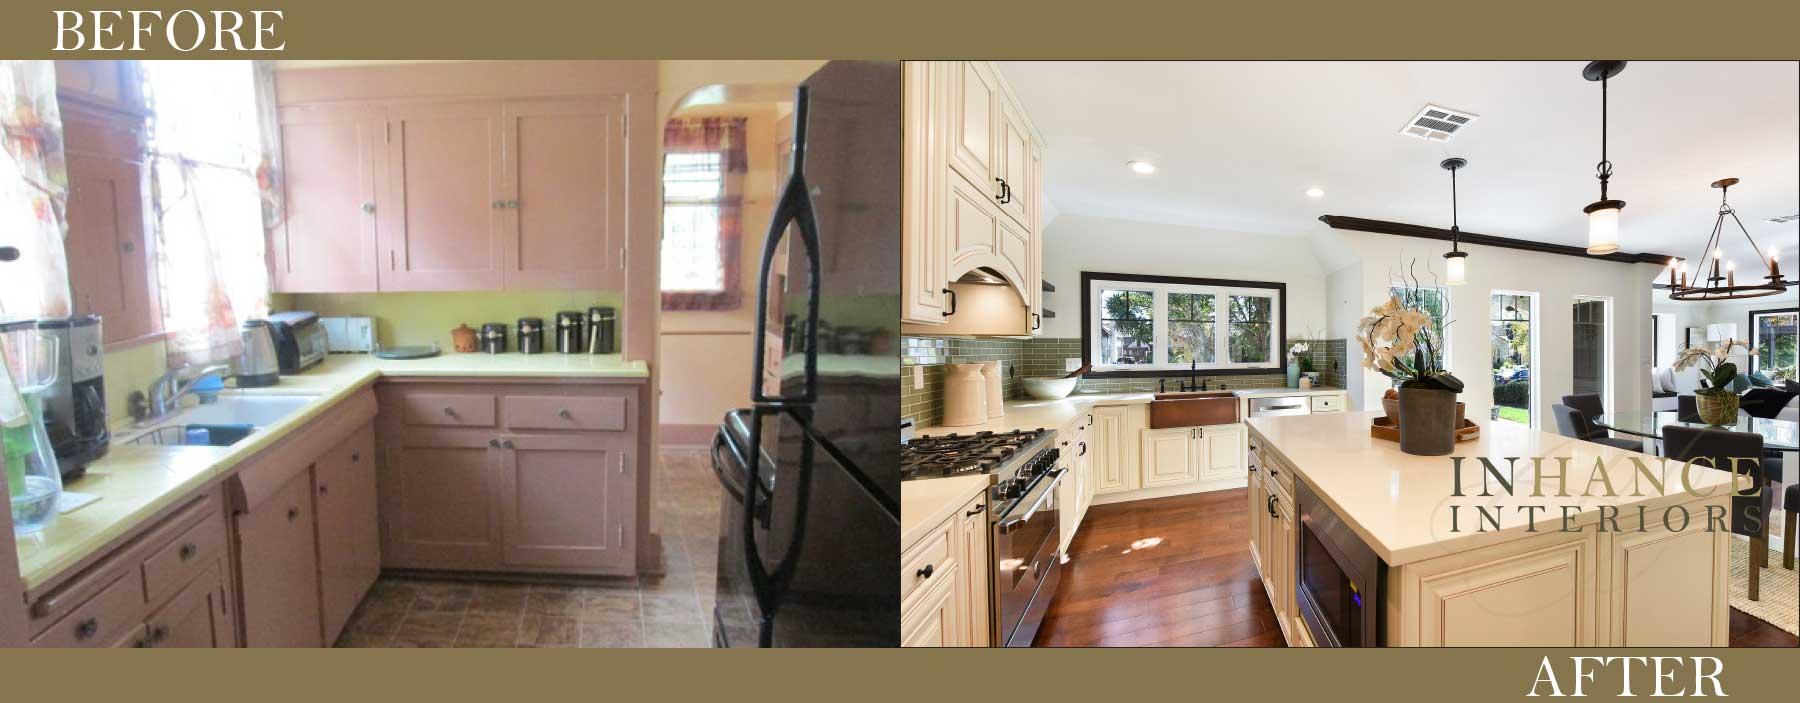 South-Orange_BeforeAfter_Kitchen.jpg